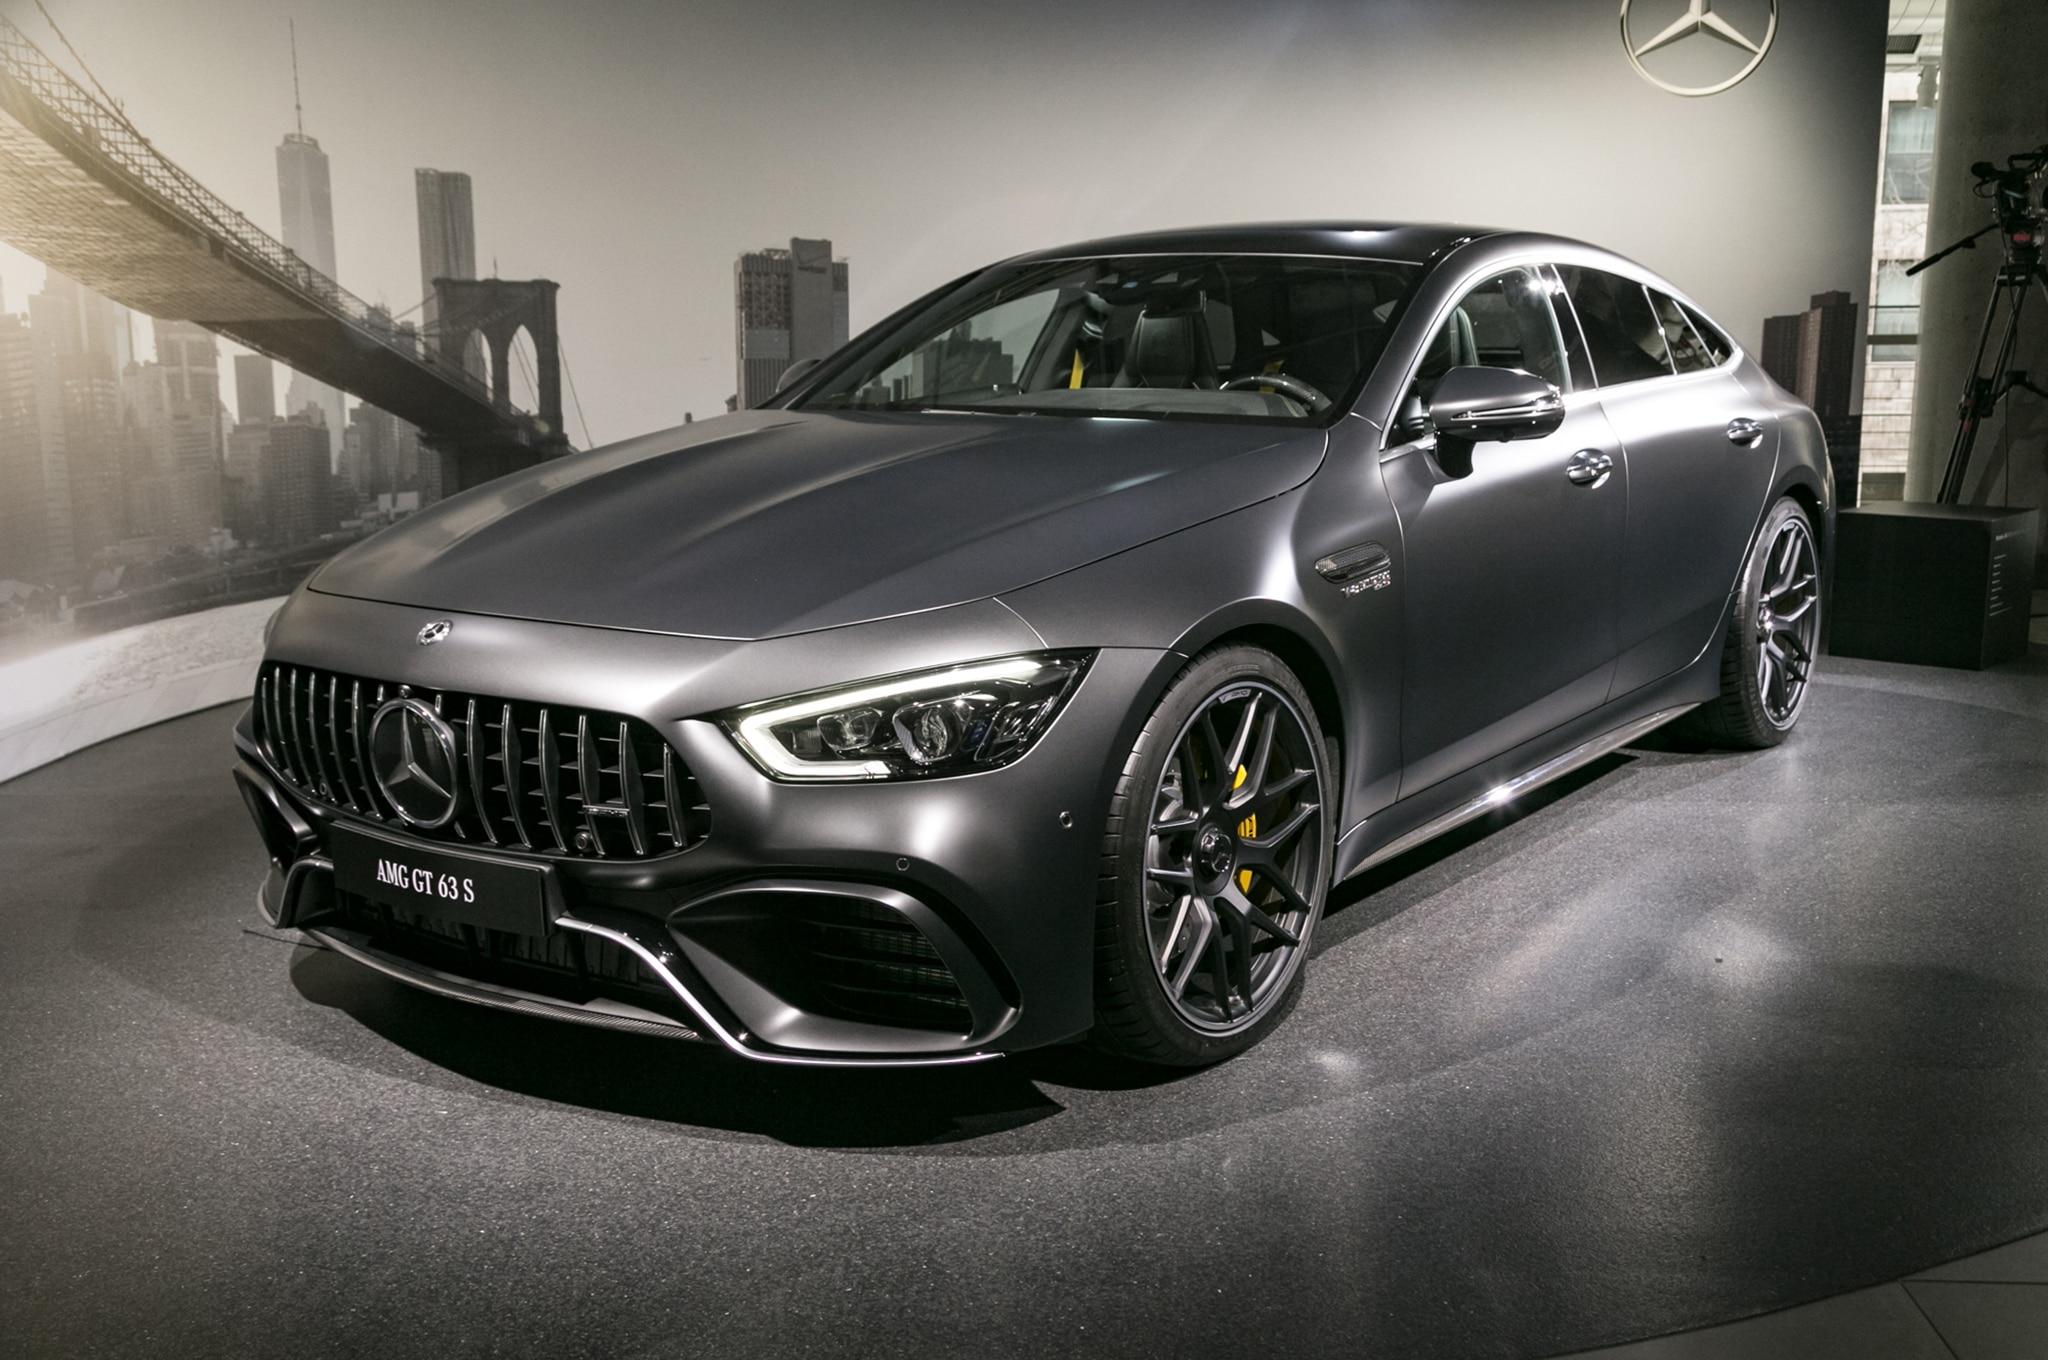 2019 Mercedes AMG GT 63 S 4 Door Coupe Front Three Quarter